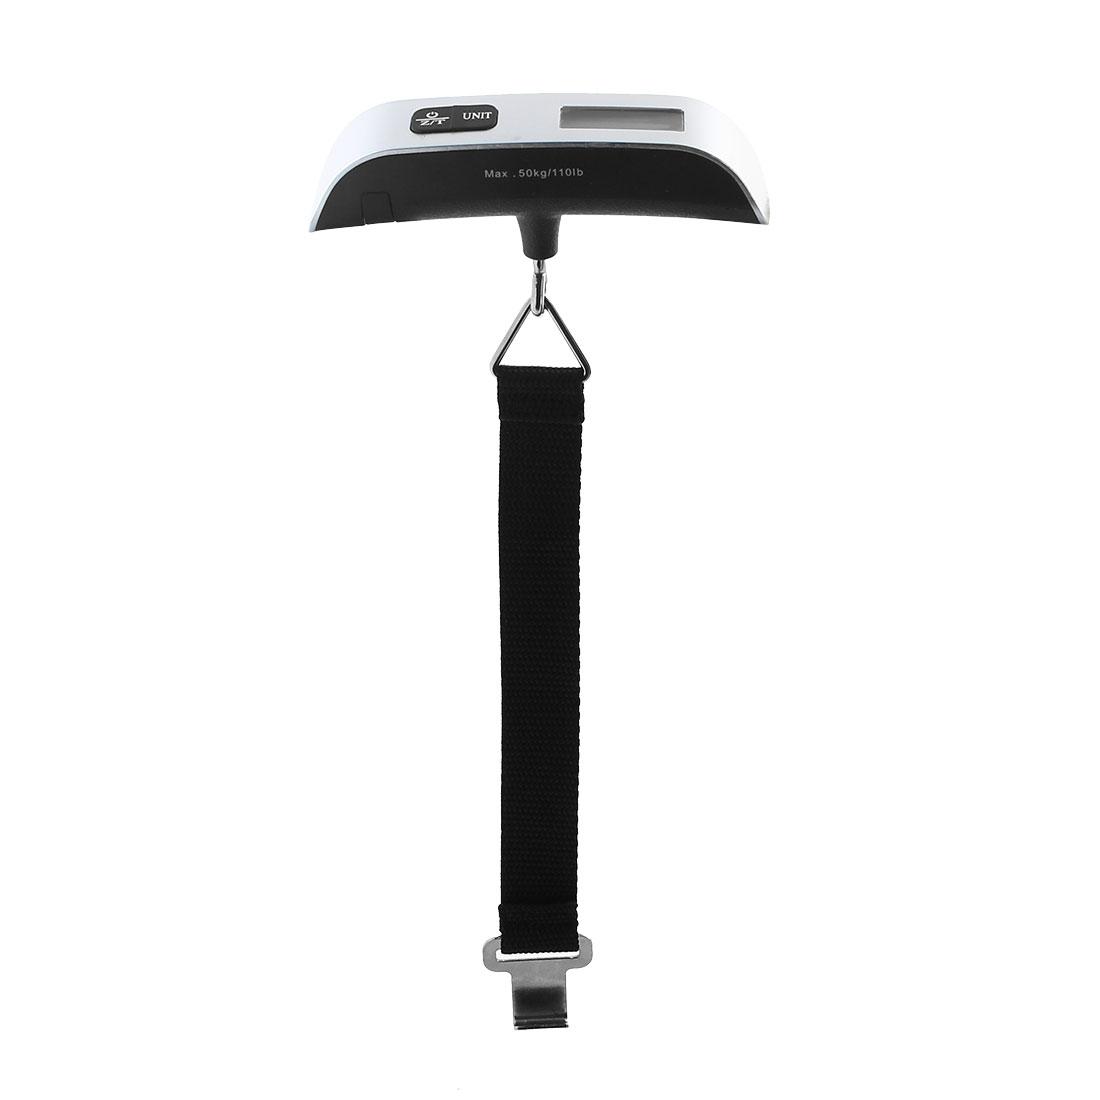 LCD Display Electronic Balance Digital Postal Luggage Hanging Scale 110lb/50kg